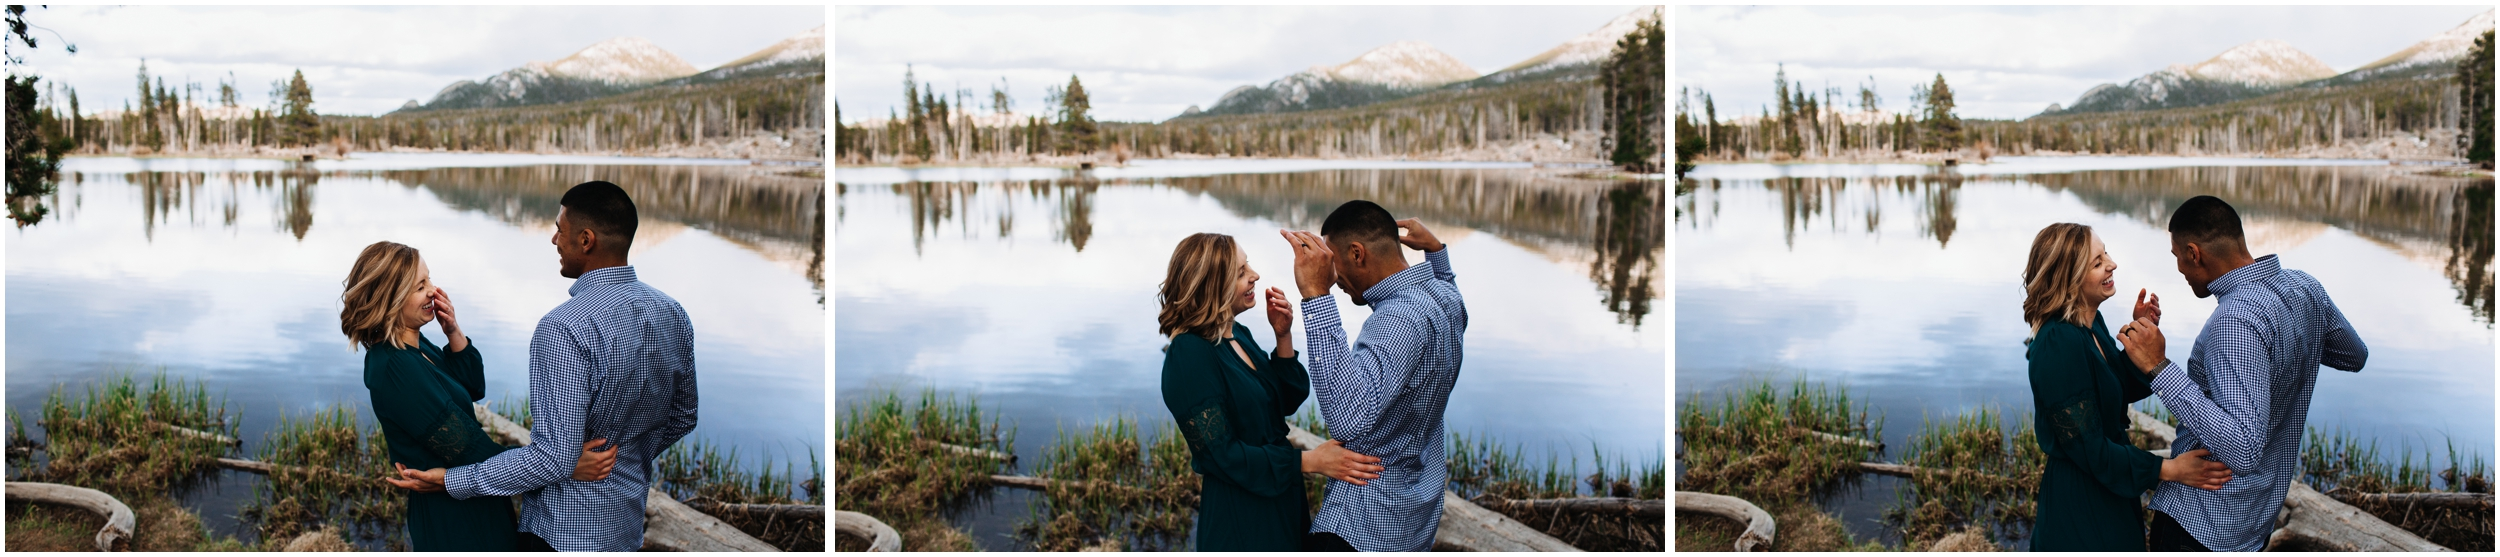 rocky-mountain-national-park-elopement-sprague-lake-colorado-adventure-wedding-photographer_taylor-powers_150.jpg